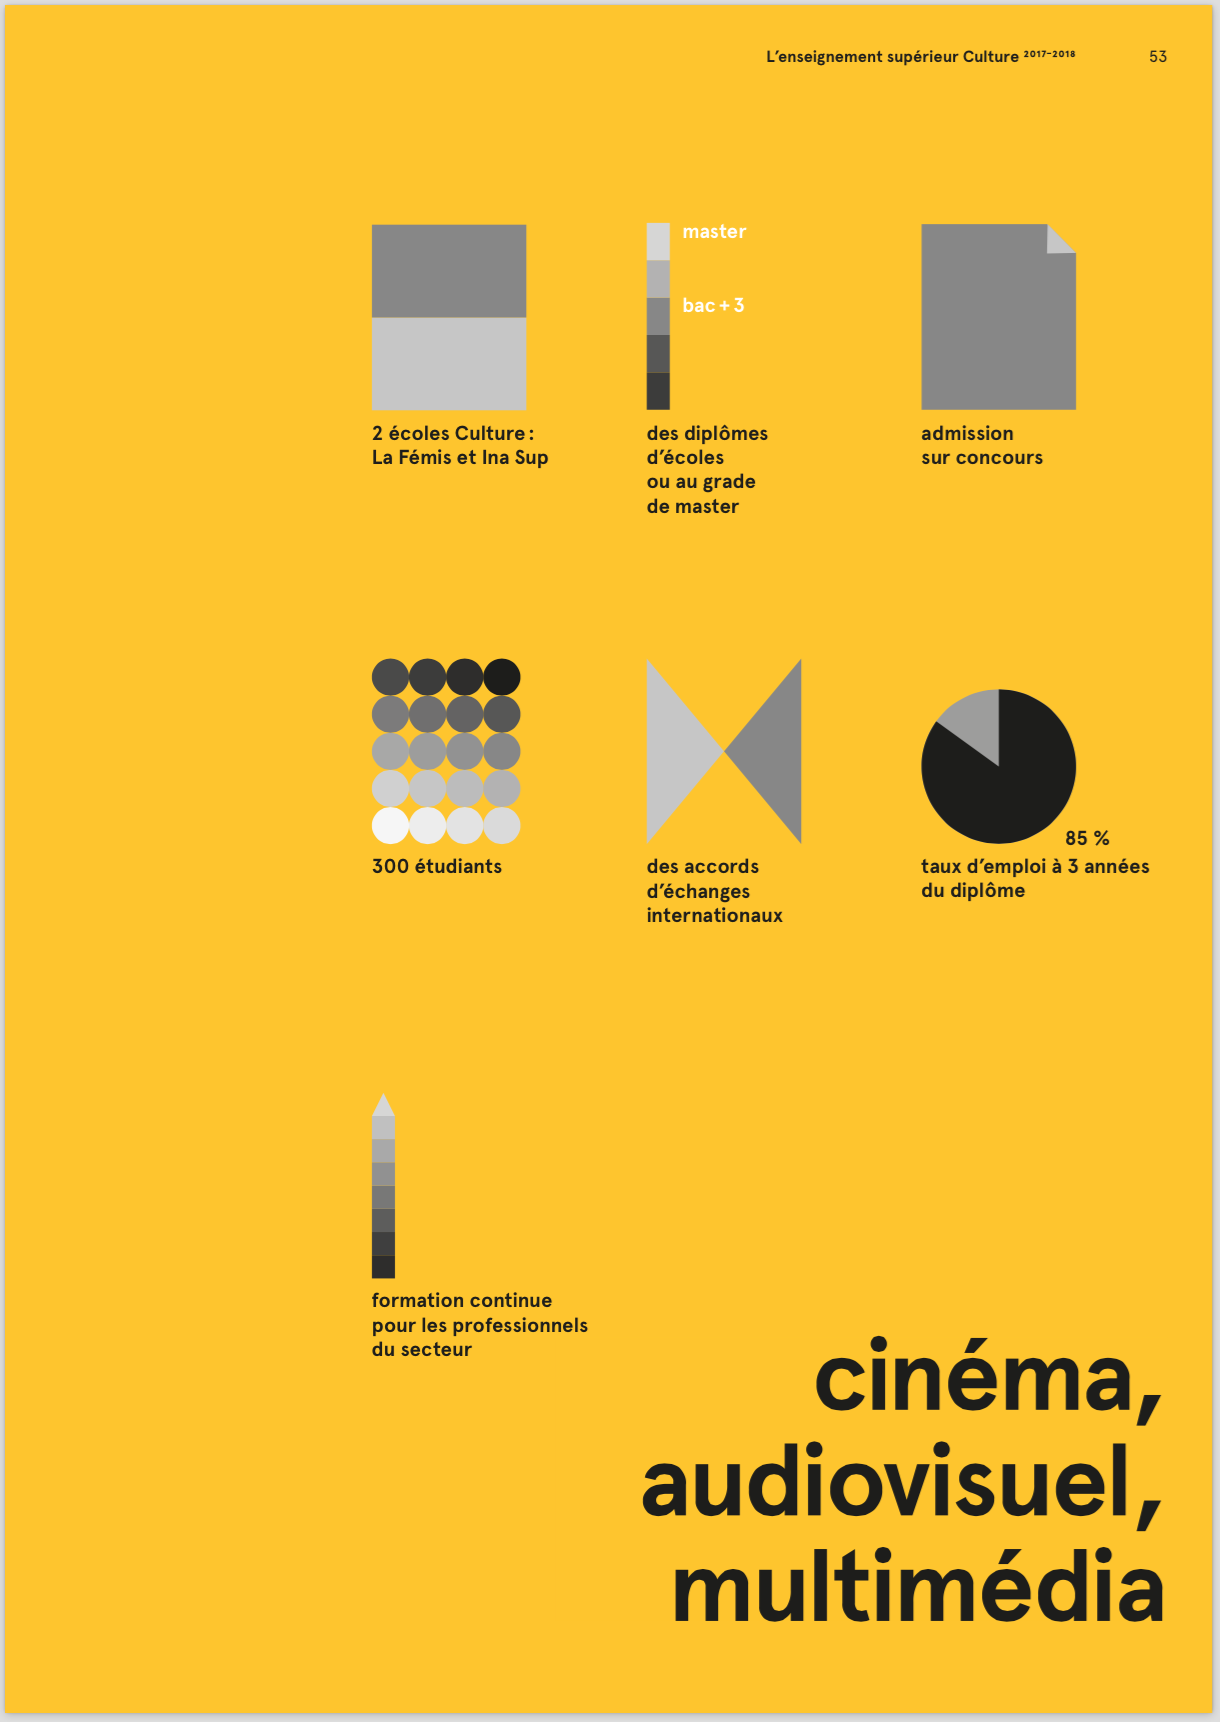 Cinema Audiovisuel Multimédia